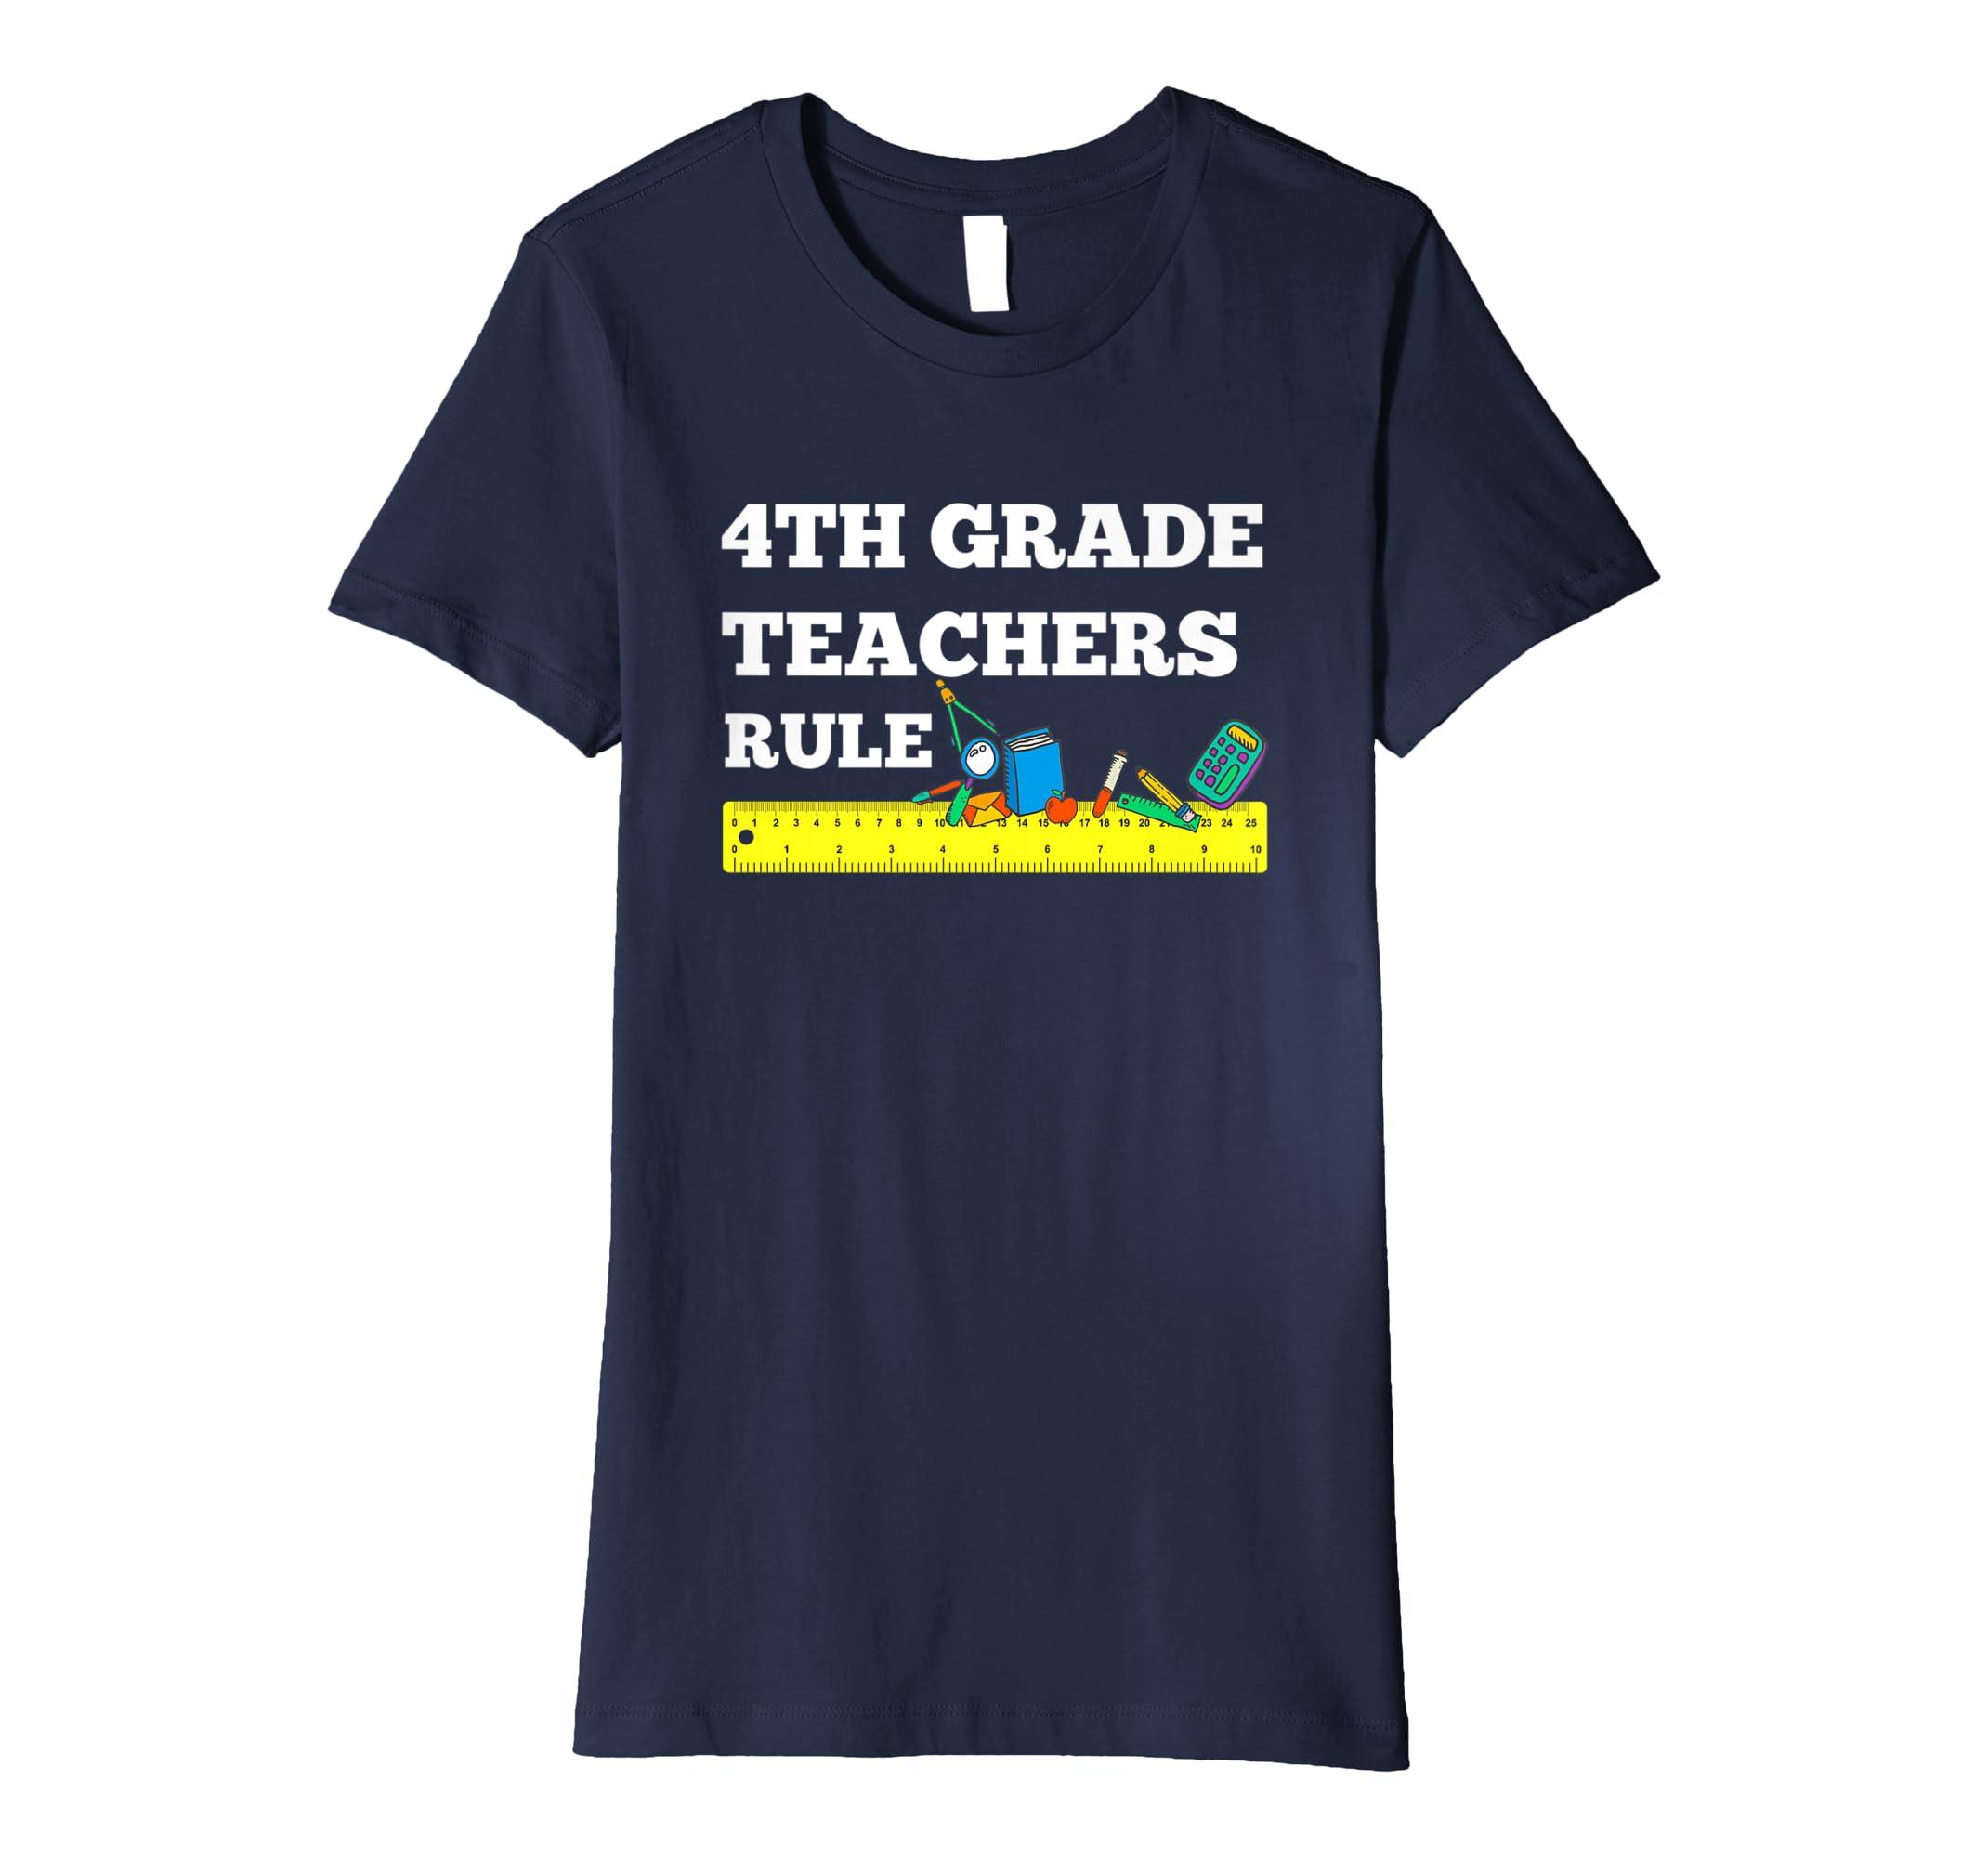 35b3f52774416 Amazon.com: Back To School 4th Grade Teachers Rule Cute Teacher's Tee:  Clothing